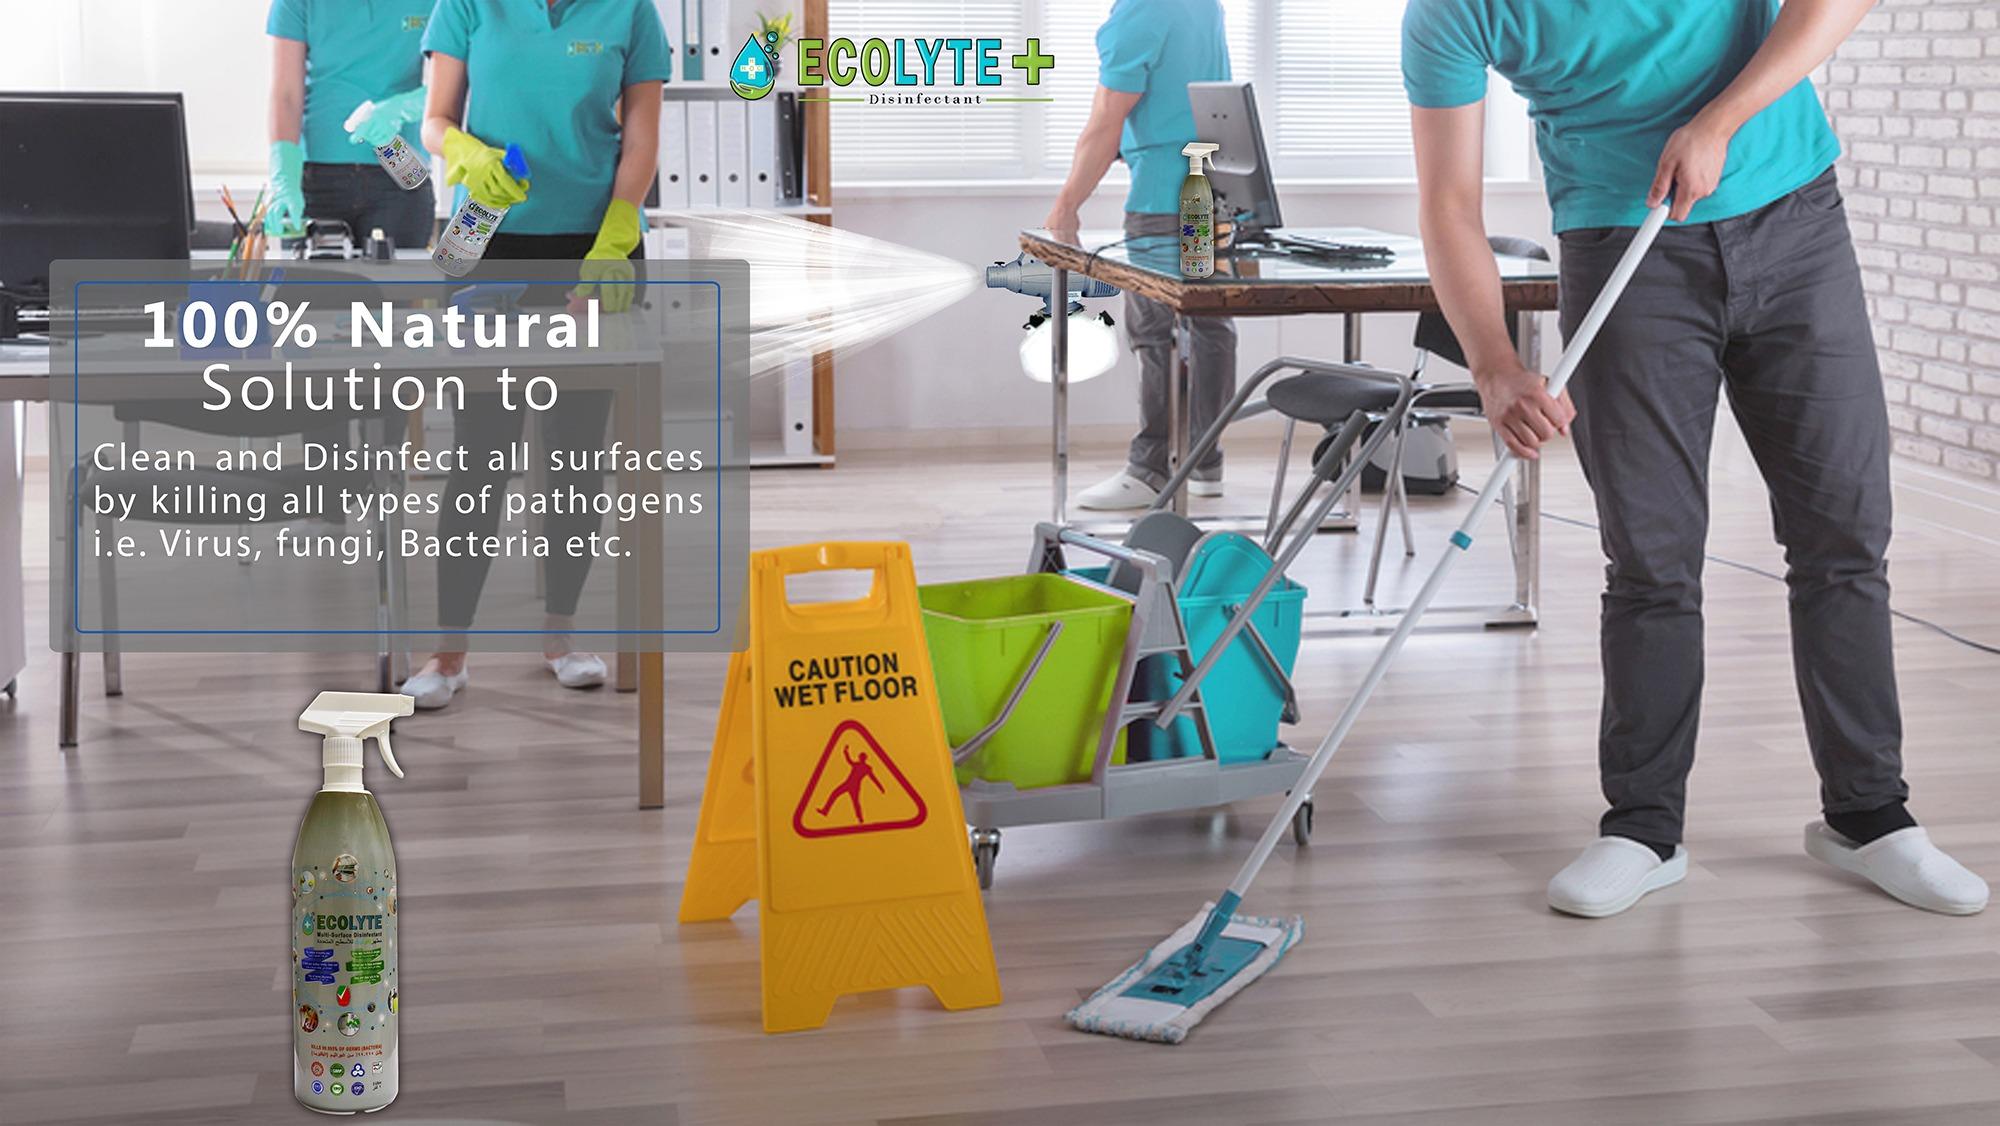 ECOLYTE-Multi-Surface-Disinfectant-1LTR-8.jpg